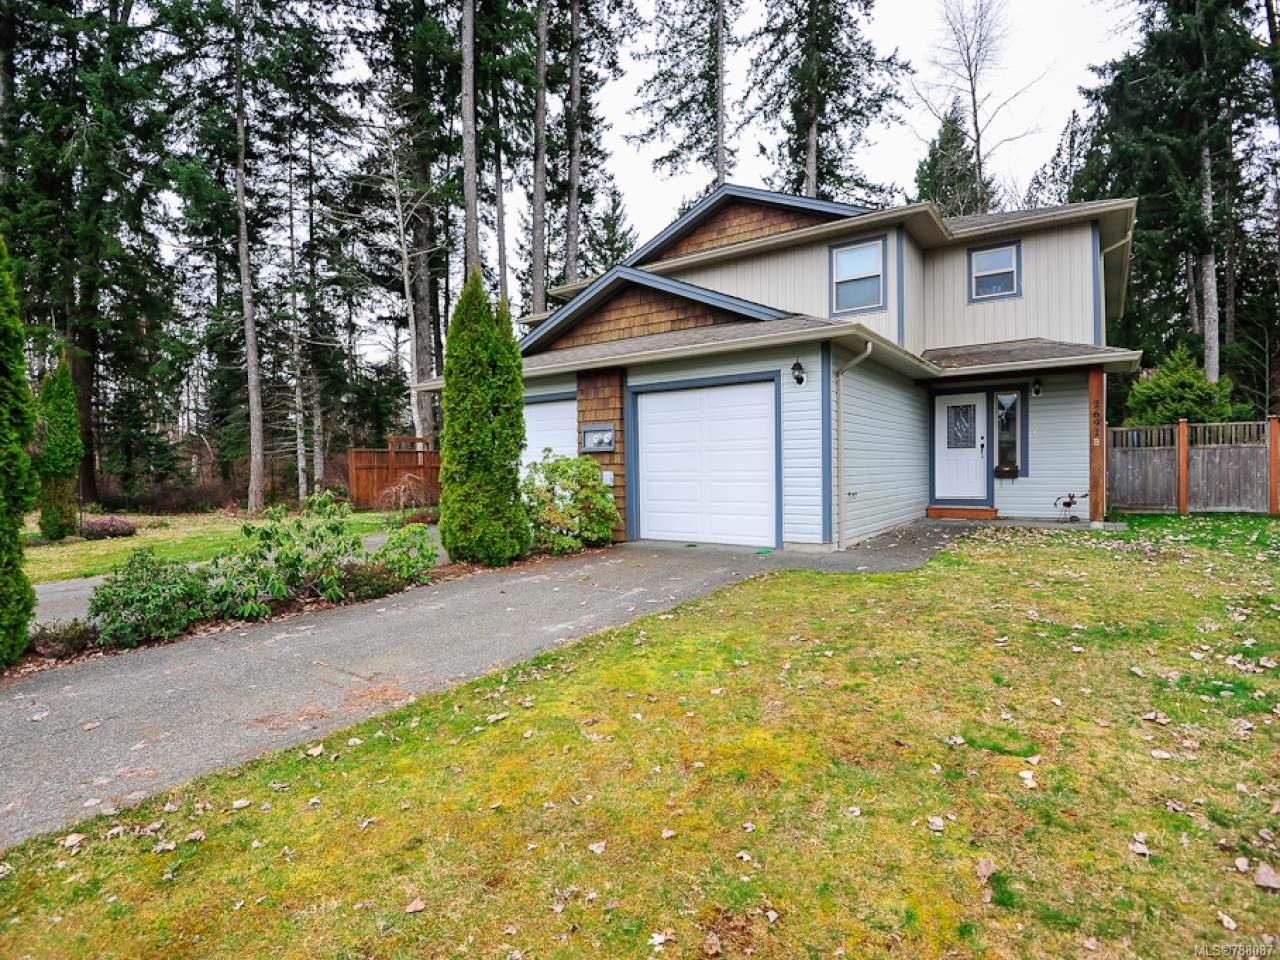 Main Photo: B 2691 Tater Pl in COURTENAY: CV Courtenay City Half Duplex for sale (Comox Valley)  : MLS®# 788087